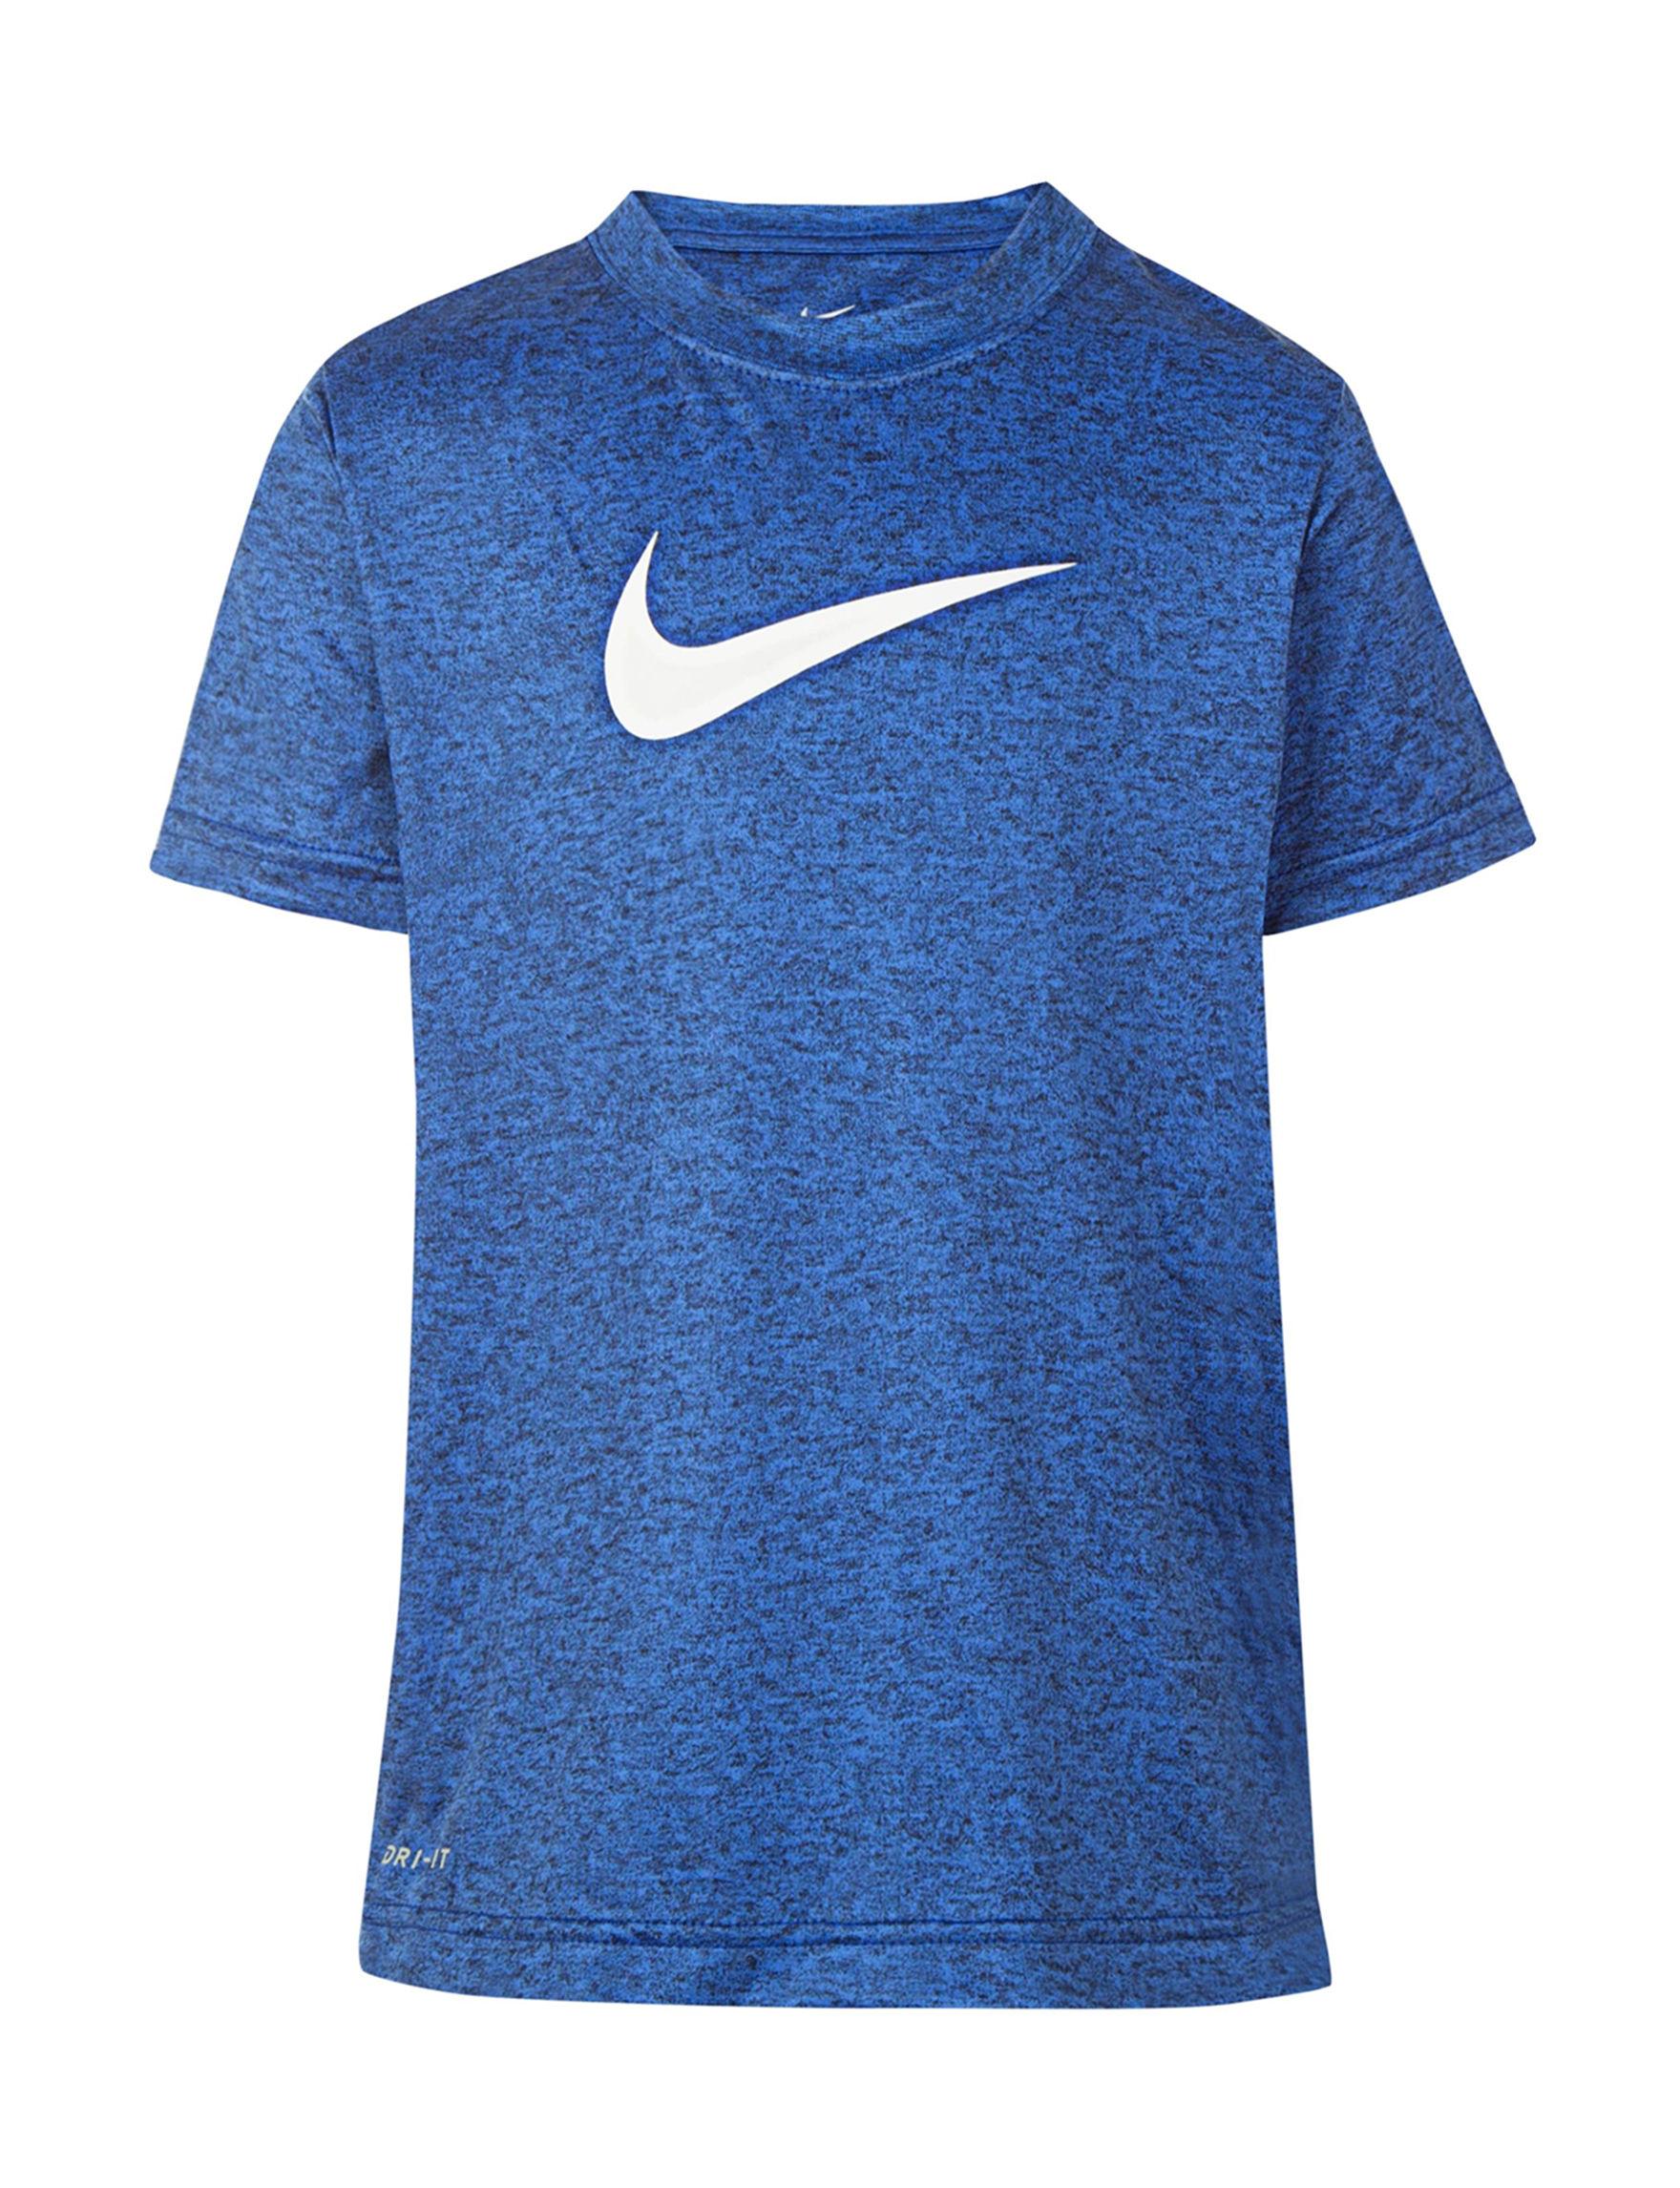 Nike Royal Blue